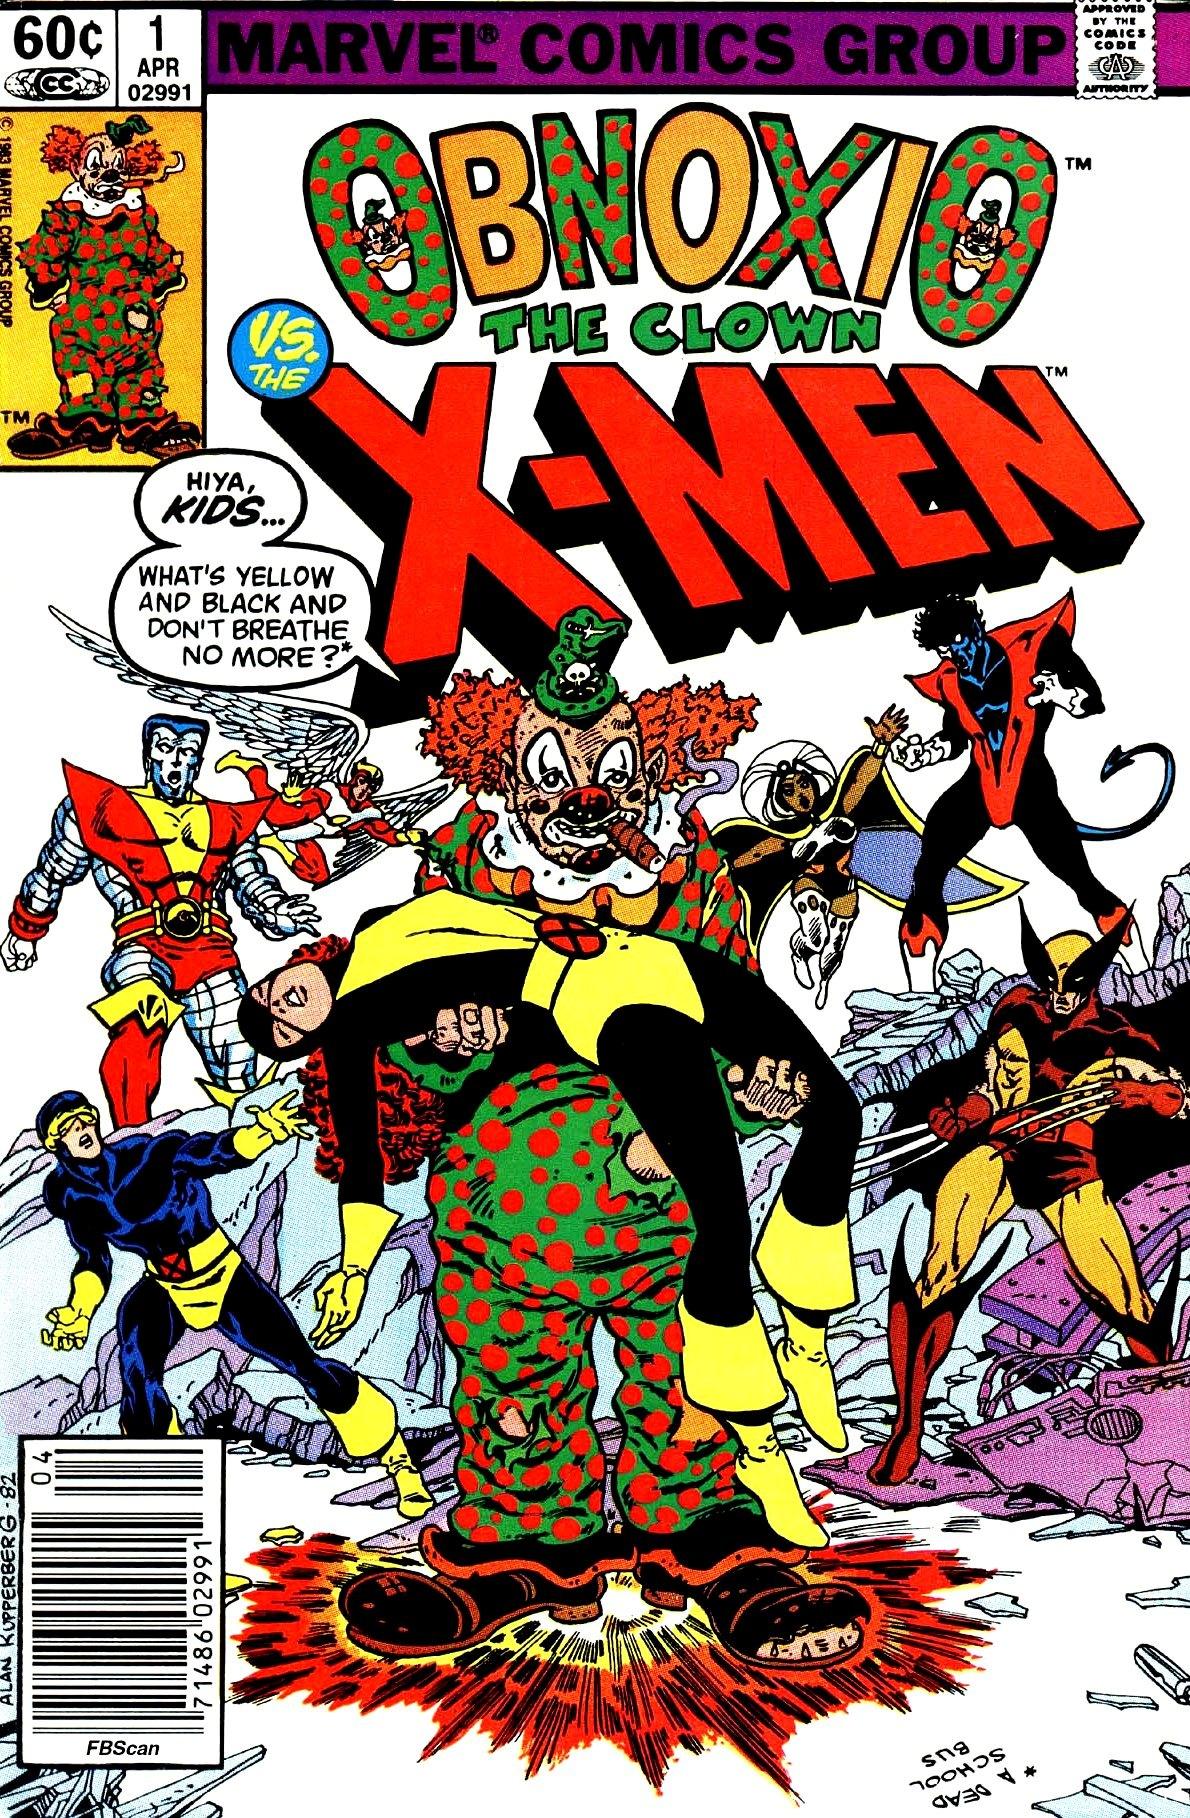 Obnoxio the Clown Vs The X-Men (1983) #1, cover by Alan Kupperberg.